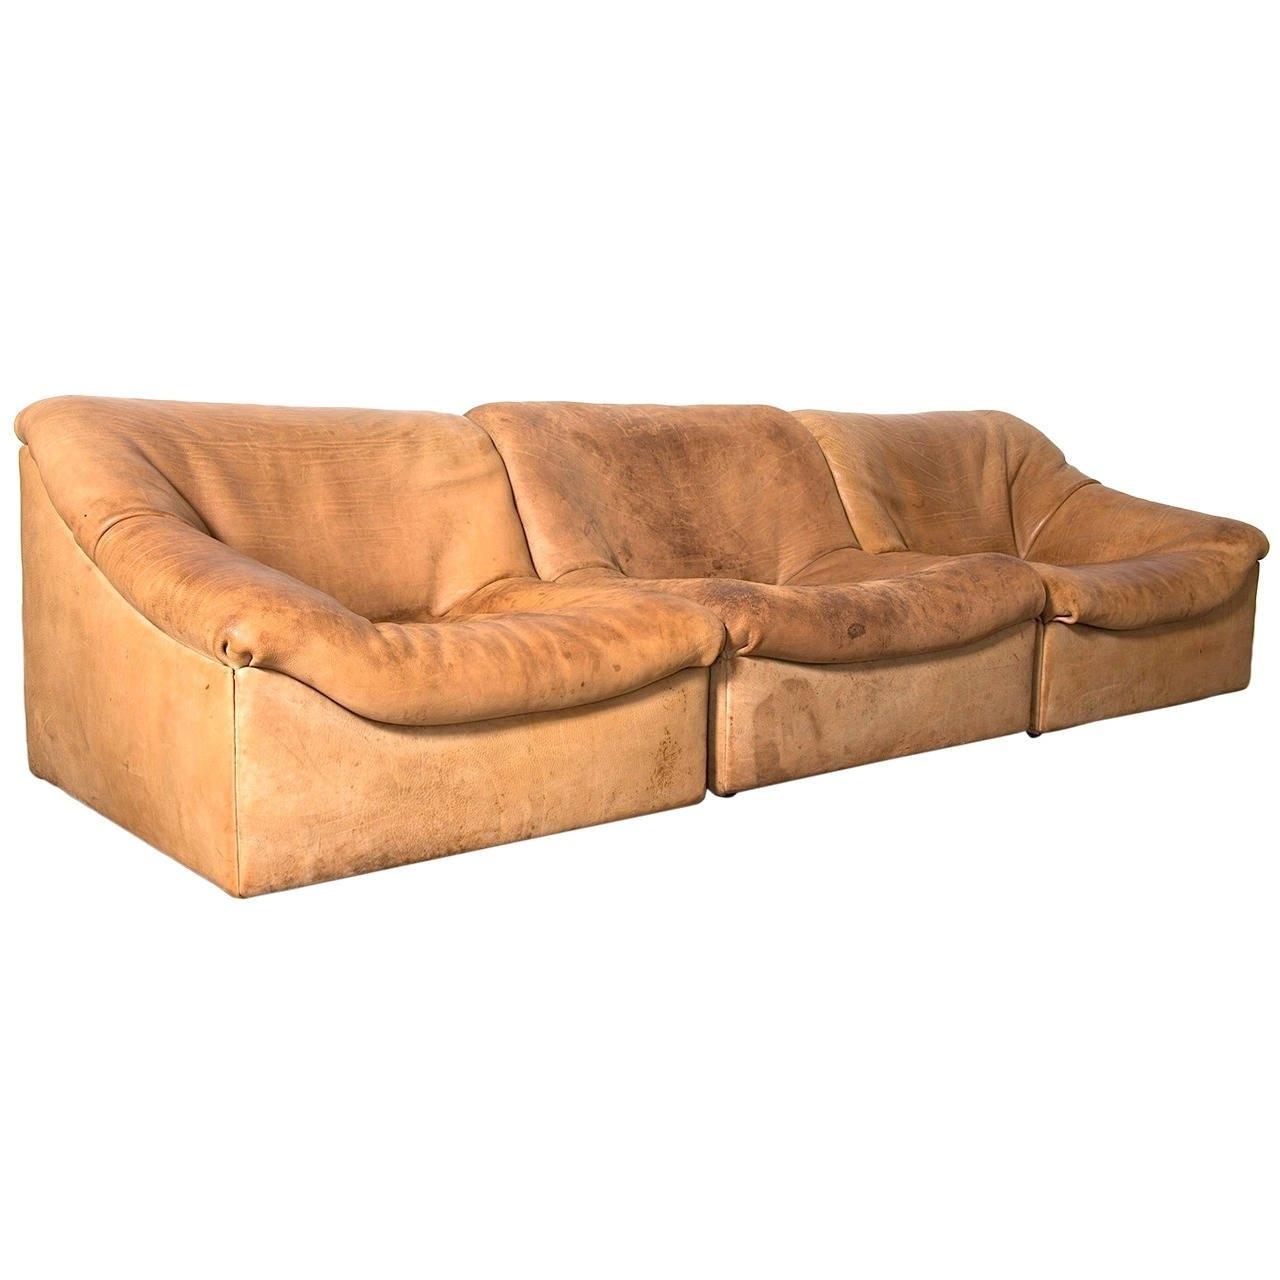 Well Liked Sofa : Sofas Buffalo Ny Design Ideas Modern Contemporary To Sofas In Sectional Sofas At Buffalo Ny (View 10 of 15)